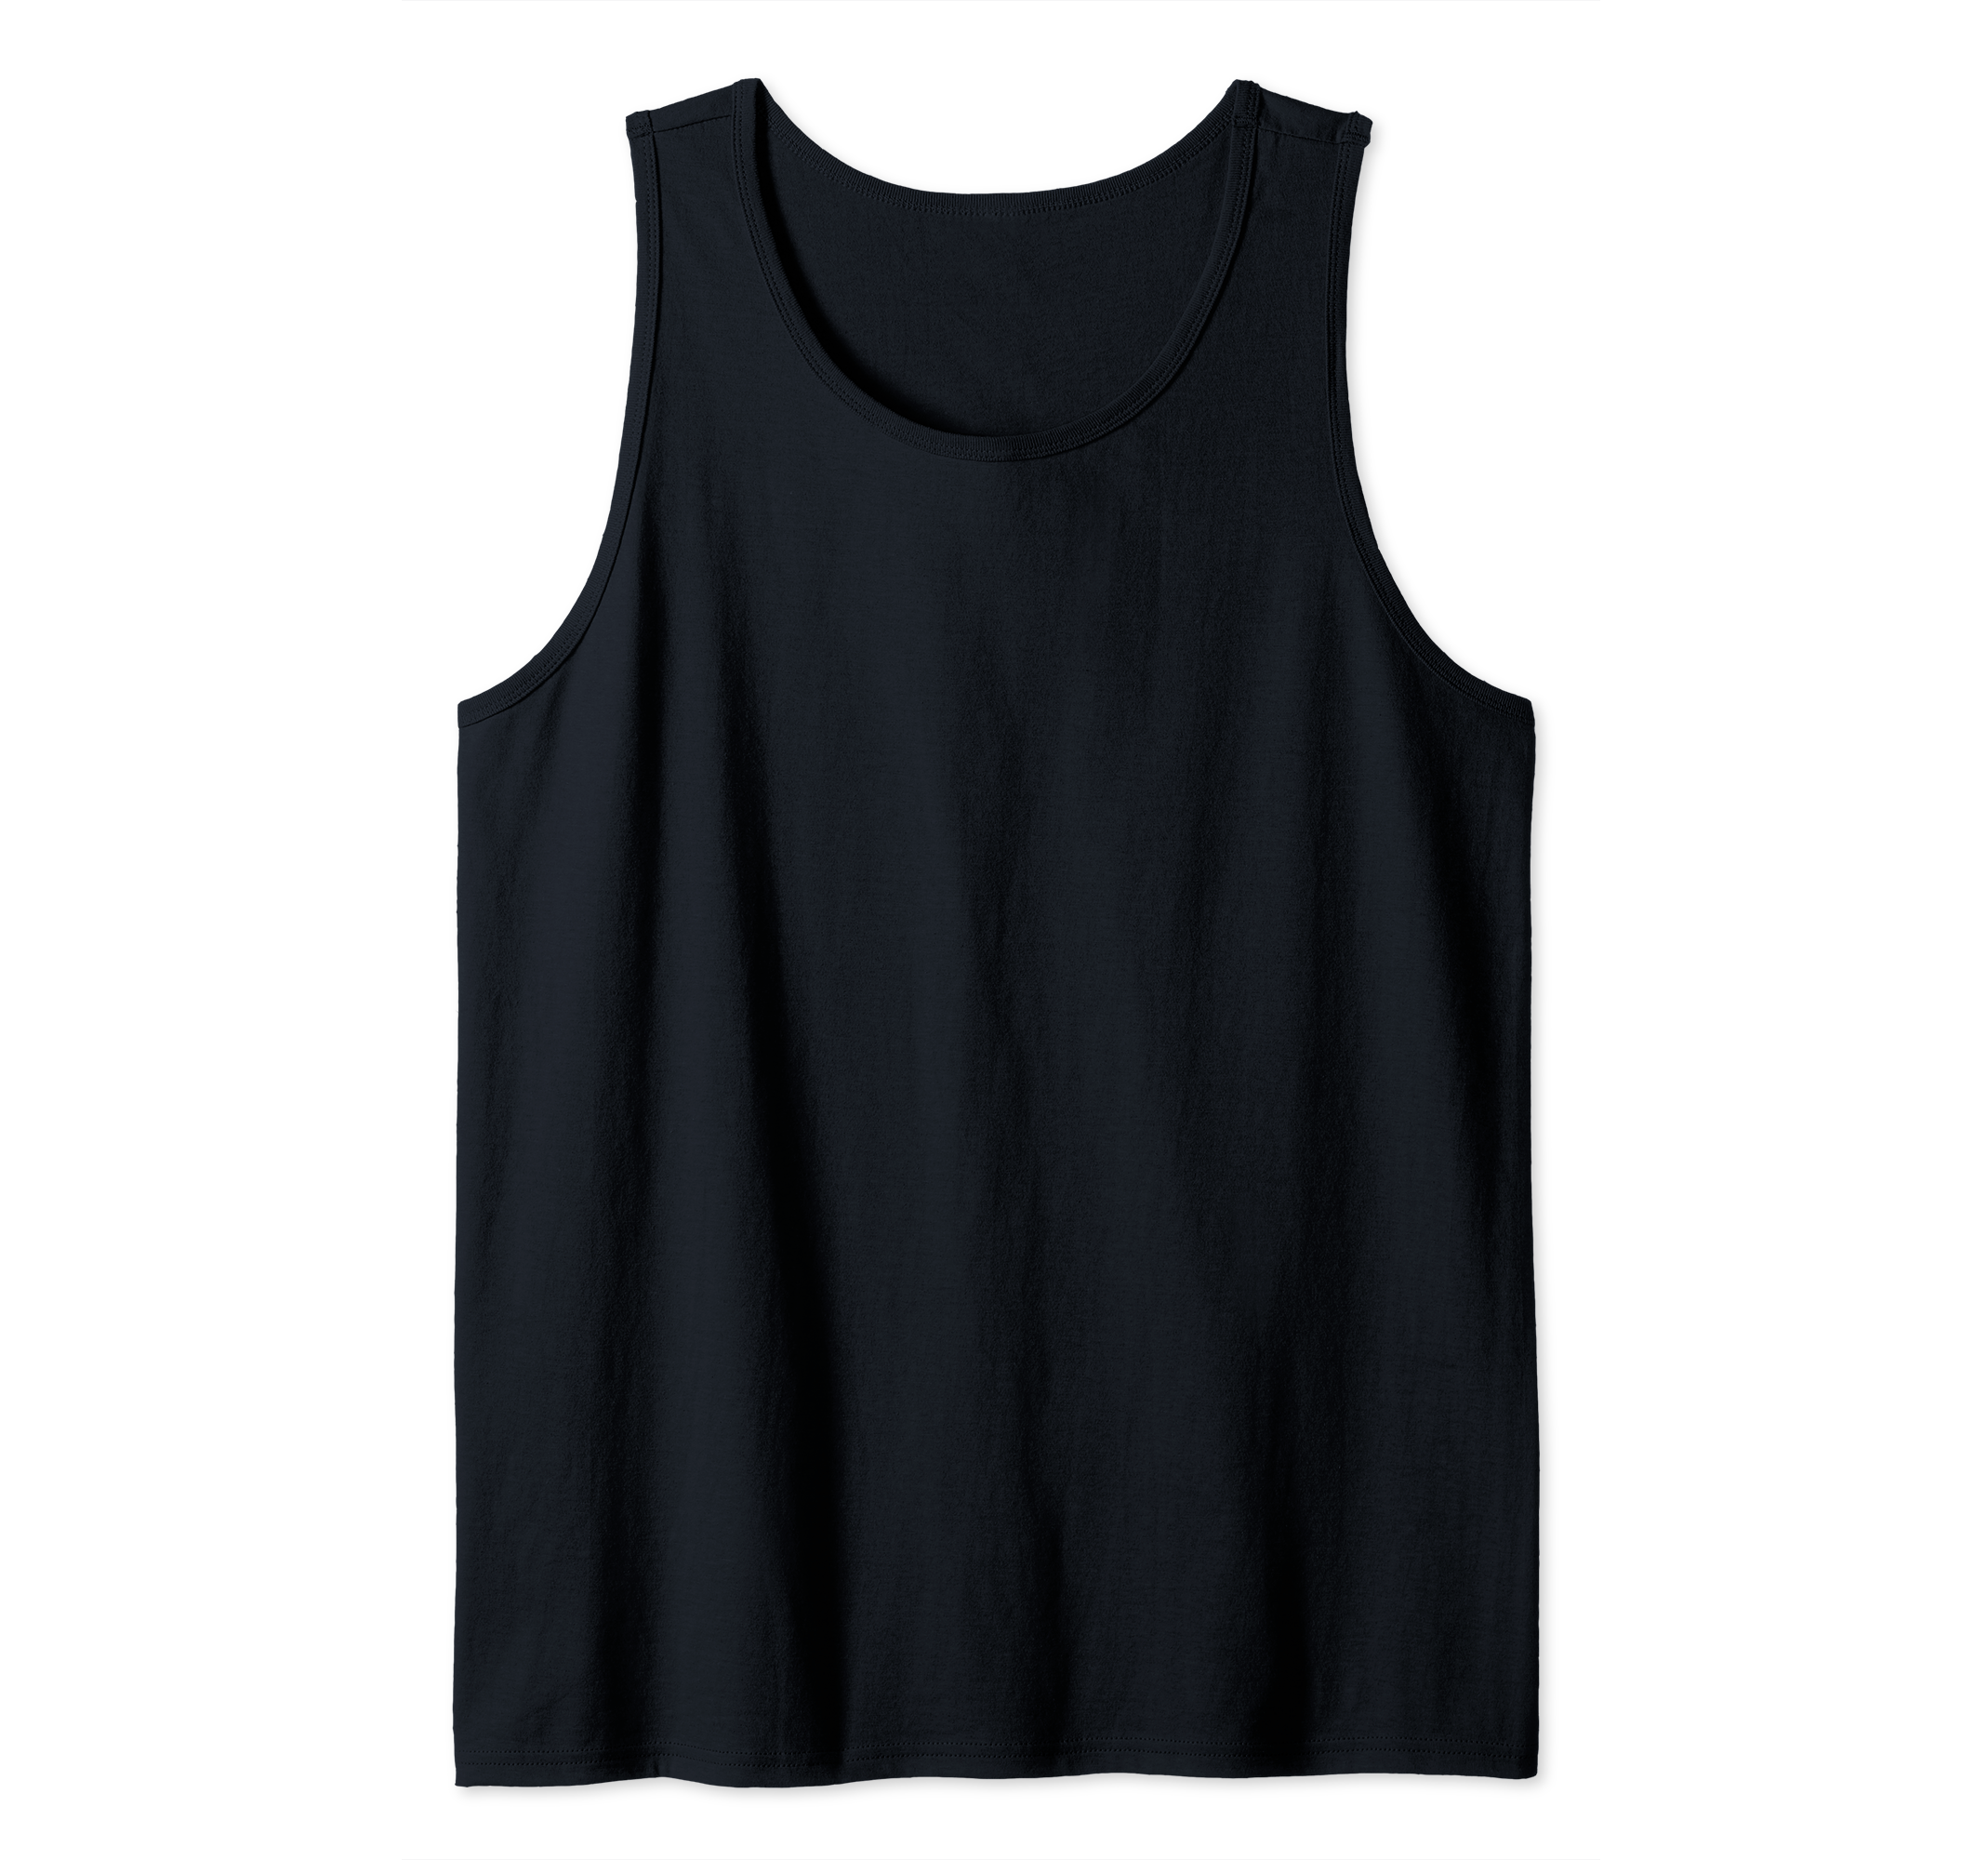 CYMRU Wales Welsh Flag Girls Women/'s Ladies Tank Top Vest T Shirt Black